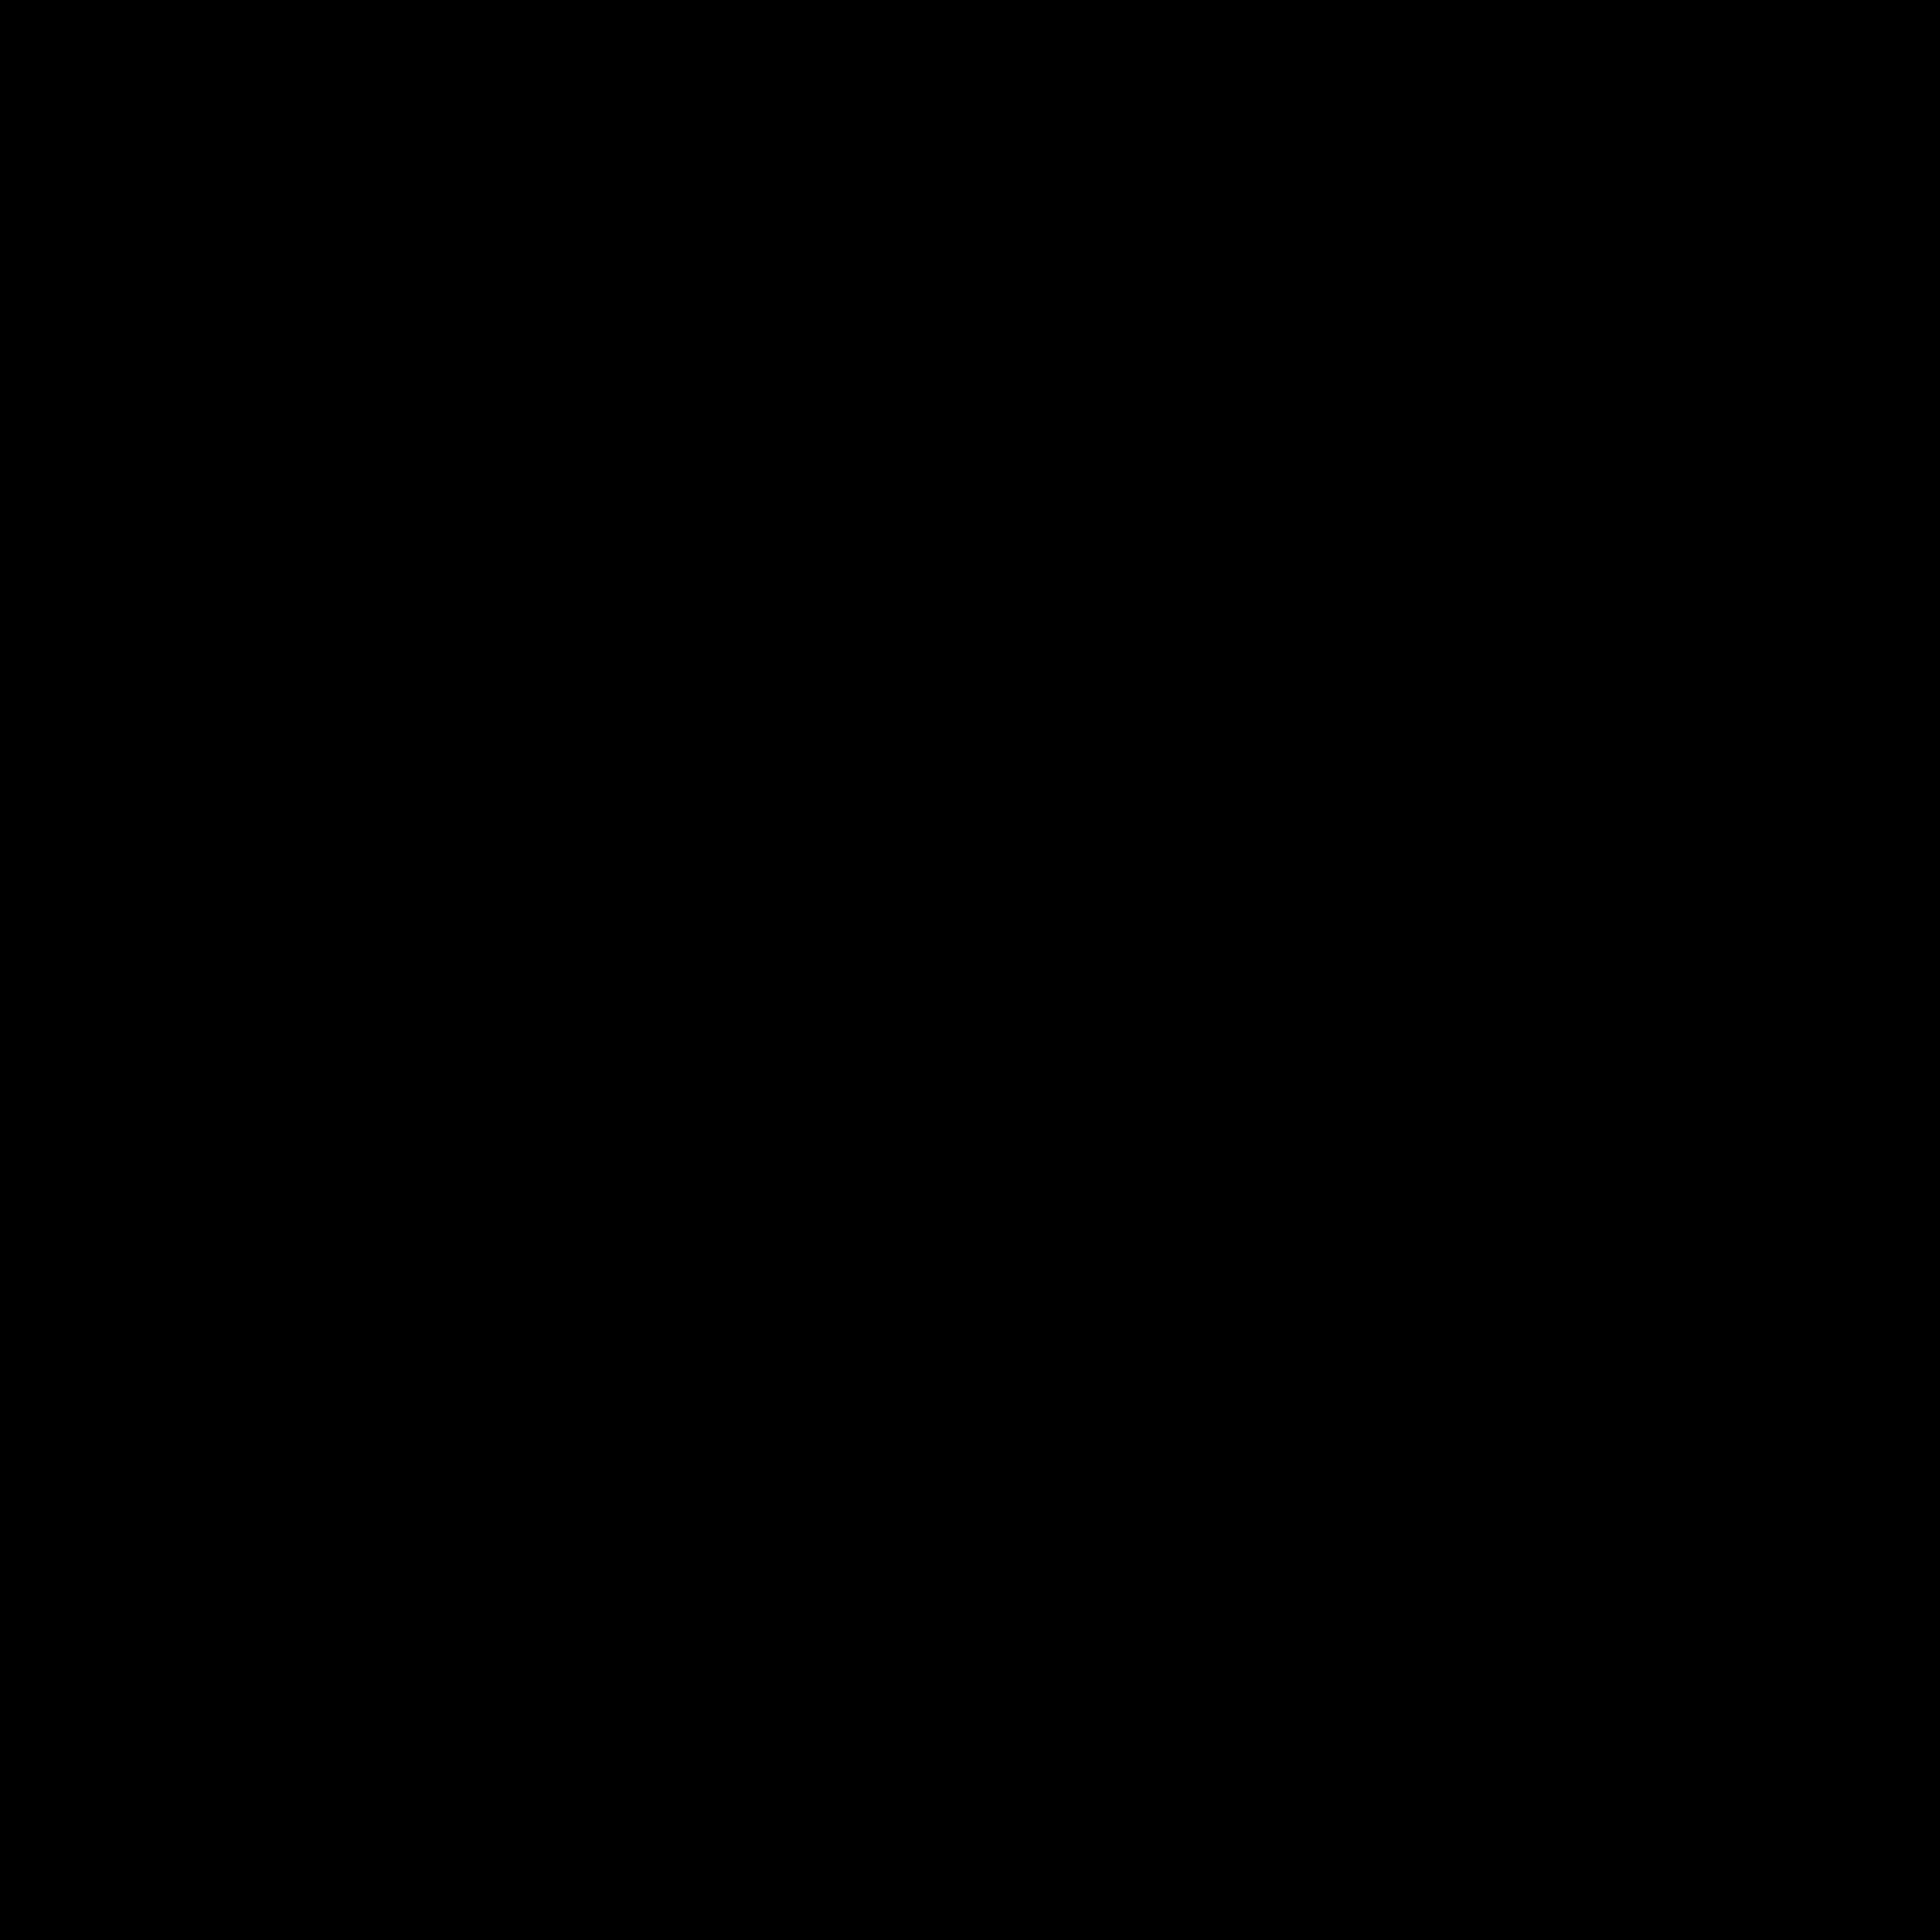 Clipart - Heart frame 4